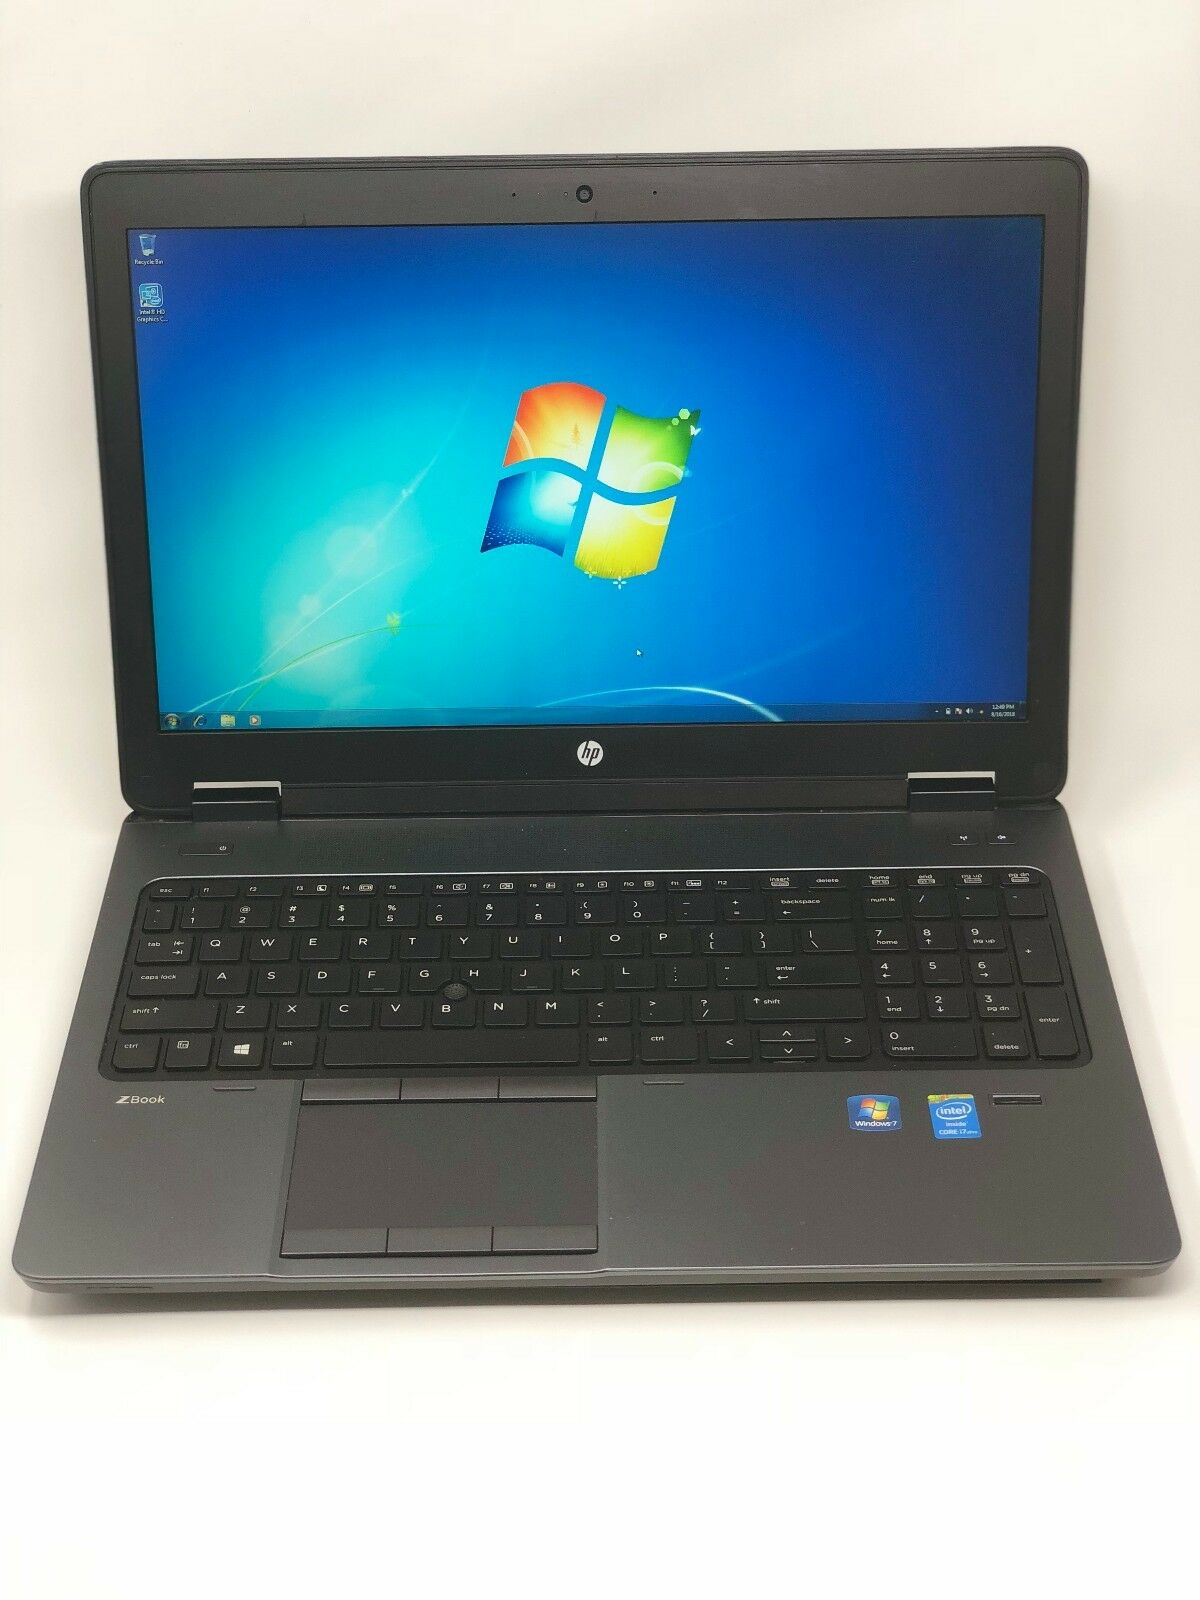 HP ZBook 15 Core i7-4800MQ 2.7GHz 4GB 1TB Win 7 K2100m 1080p Gaming Laptop